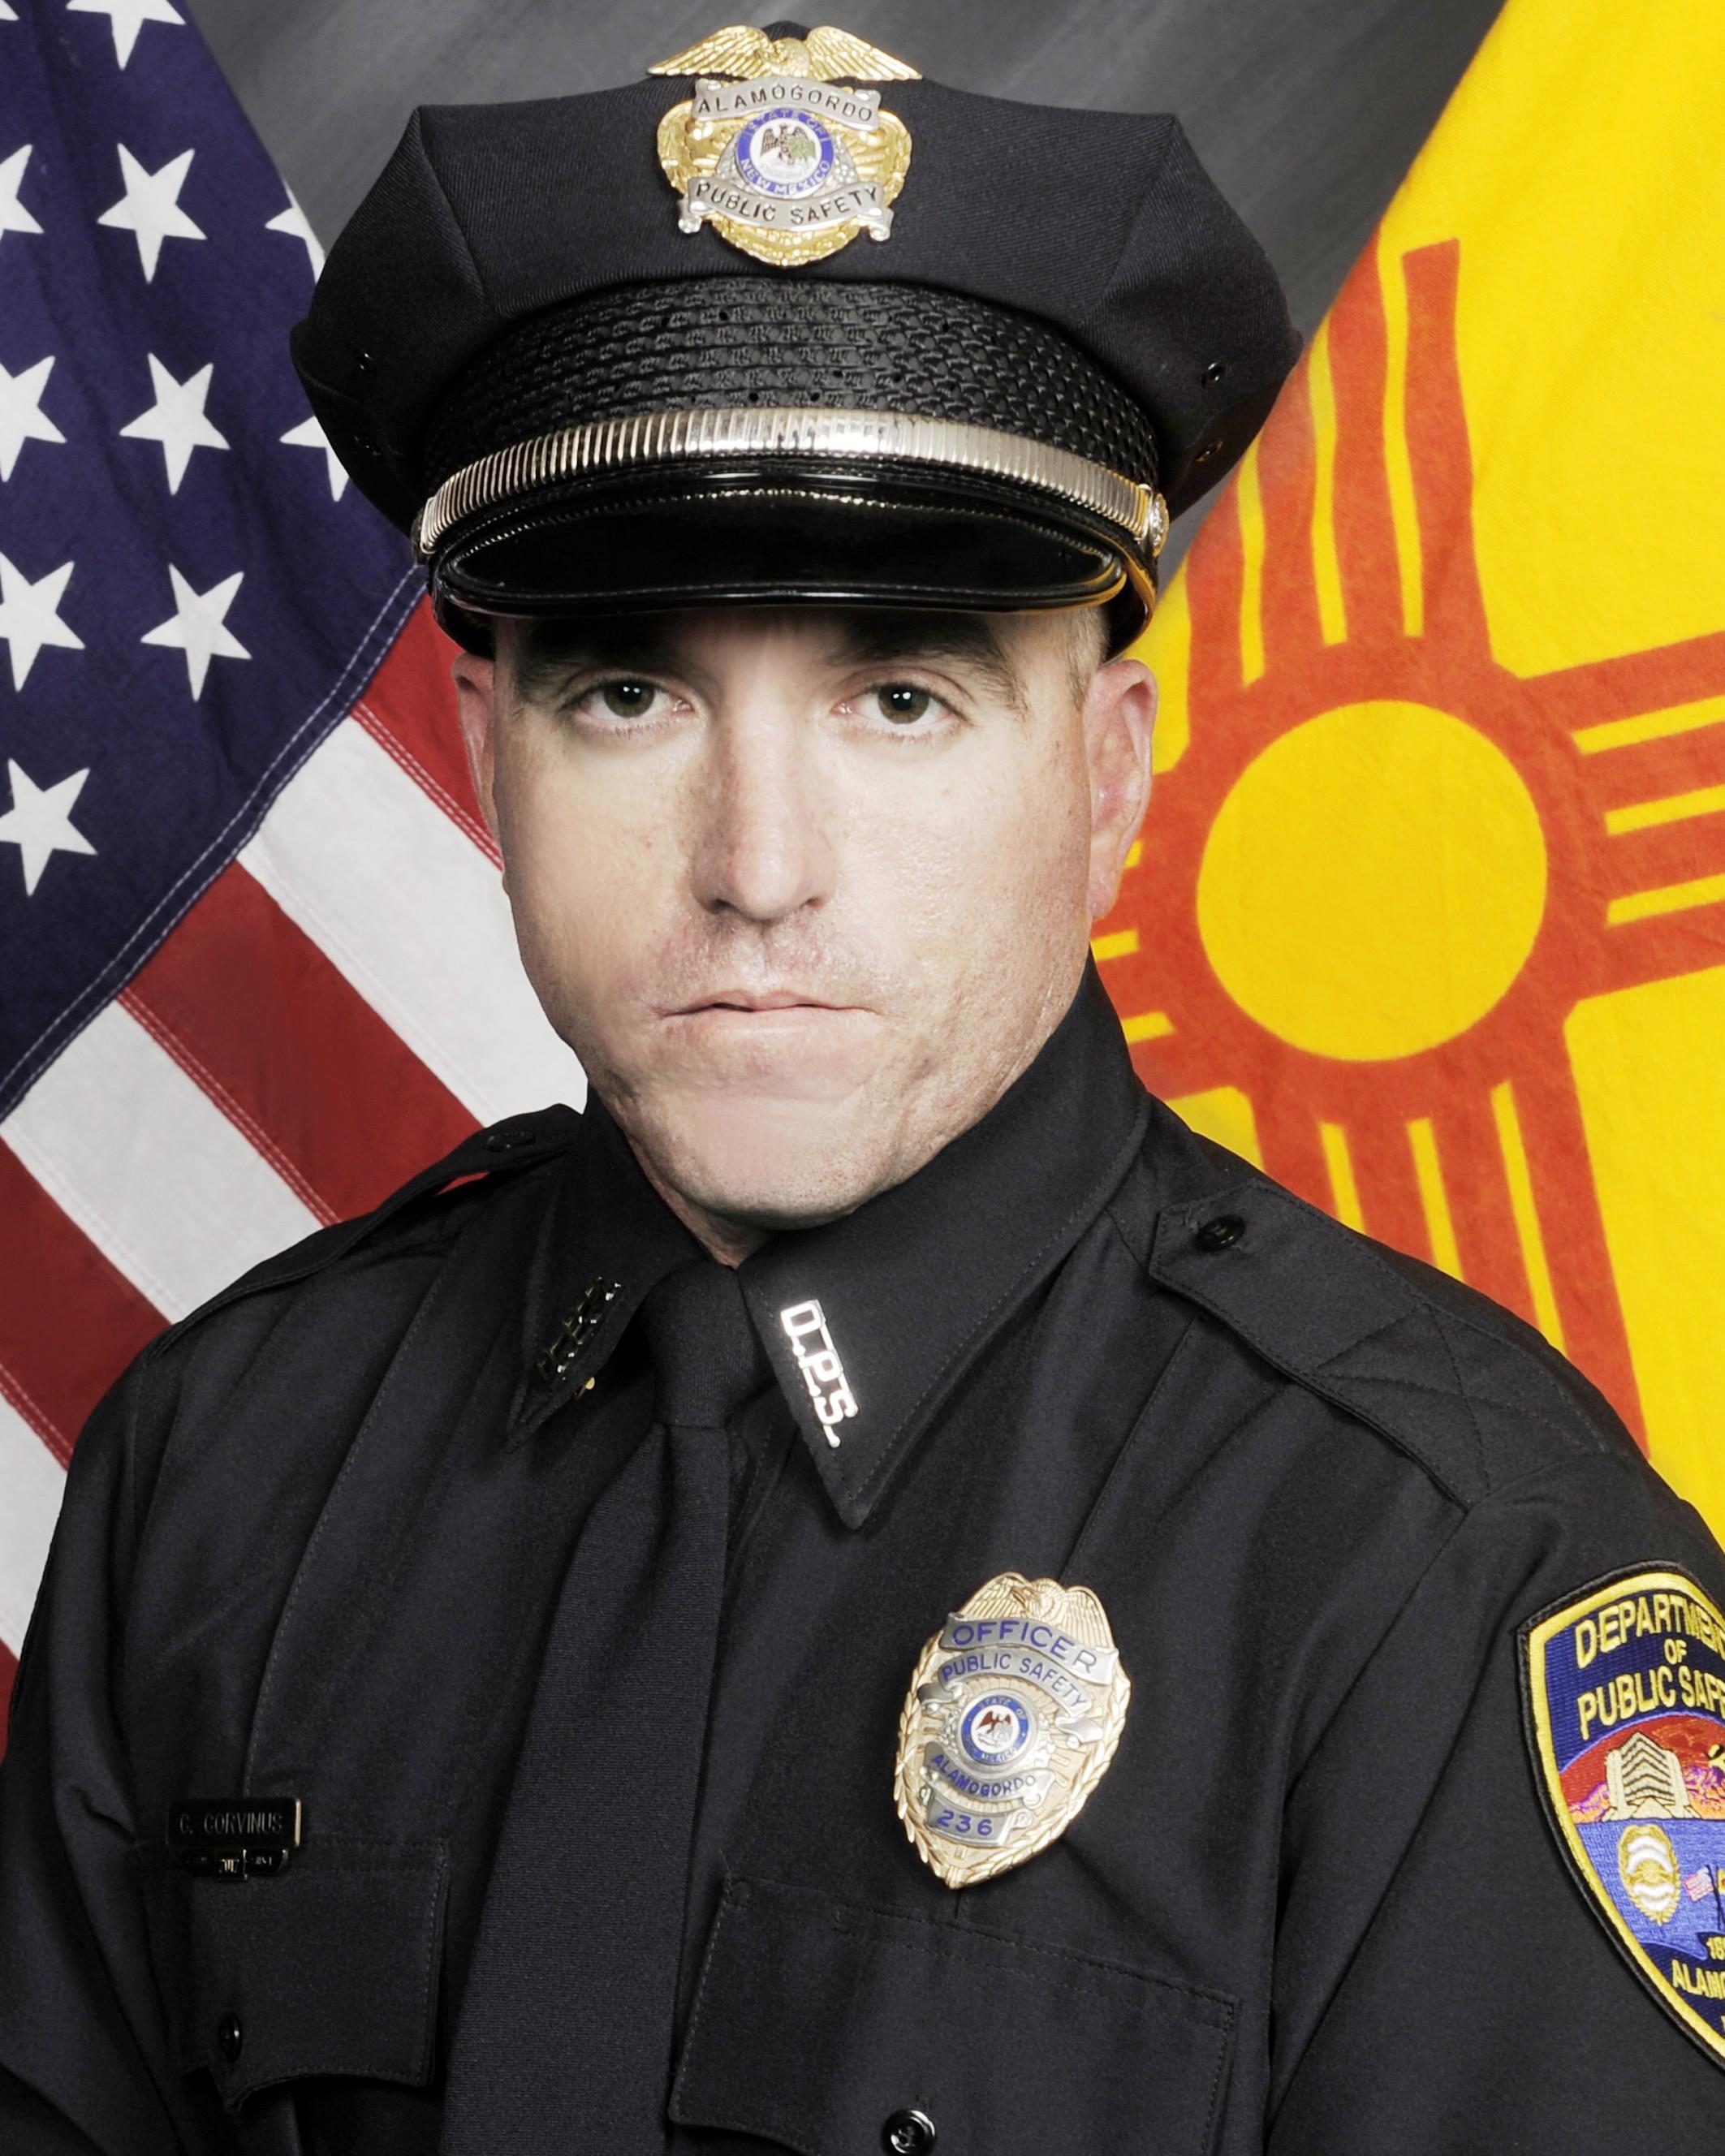 Police Officer Clint E. Corvinus | Alamogordo Police Department, New Mexico